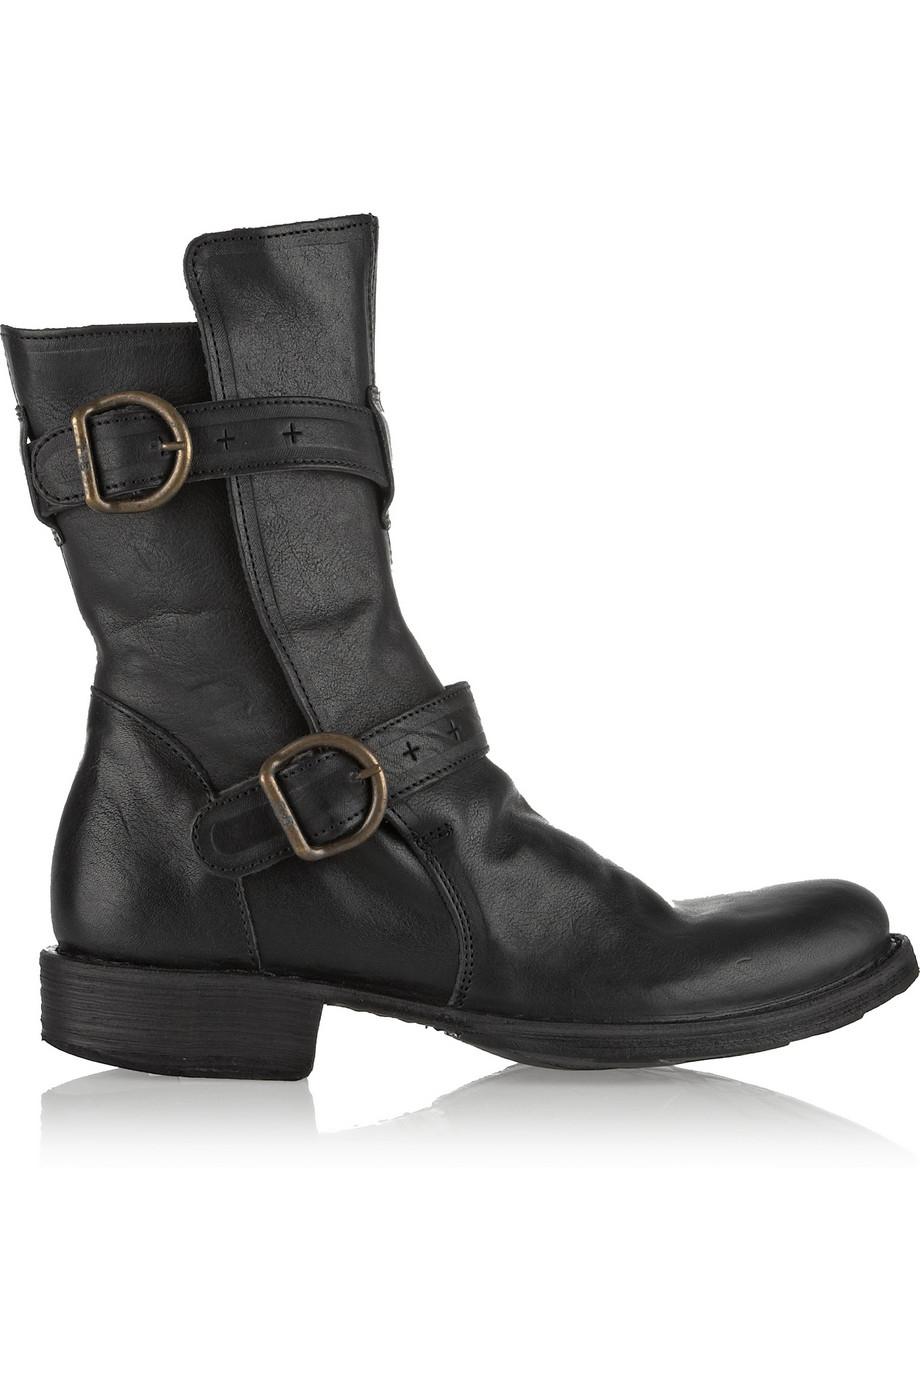 fiorentini baker eternity leather biker boots in black. Black Bedroom Furniture Sets. Home Design Ideas